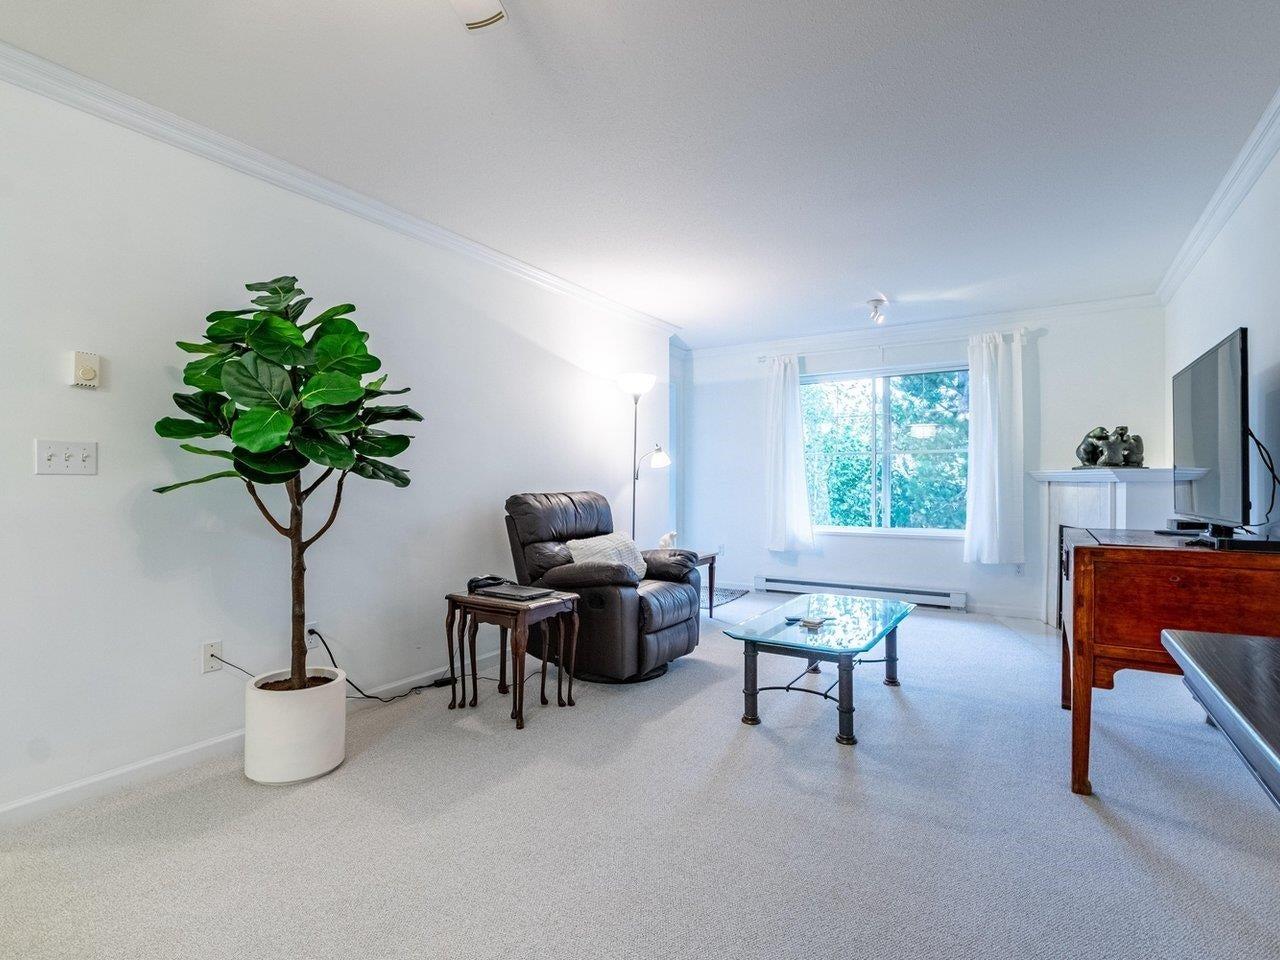 306 15298 20 AVENUE - King George Corridor Apartment/Condo for sale, 2 Bedrooms (R2625551) - #13